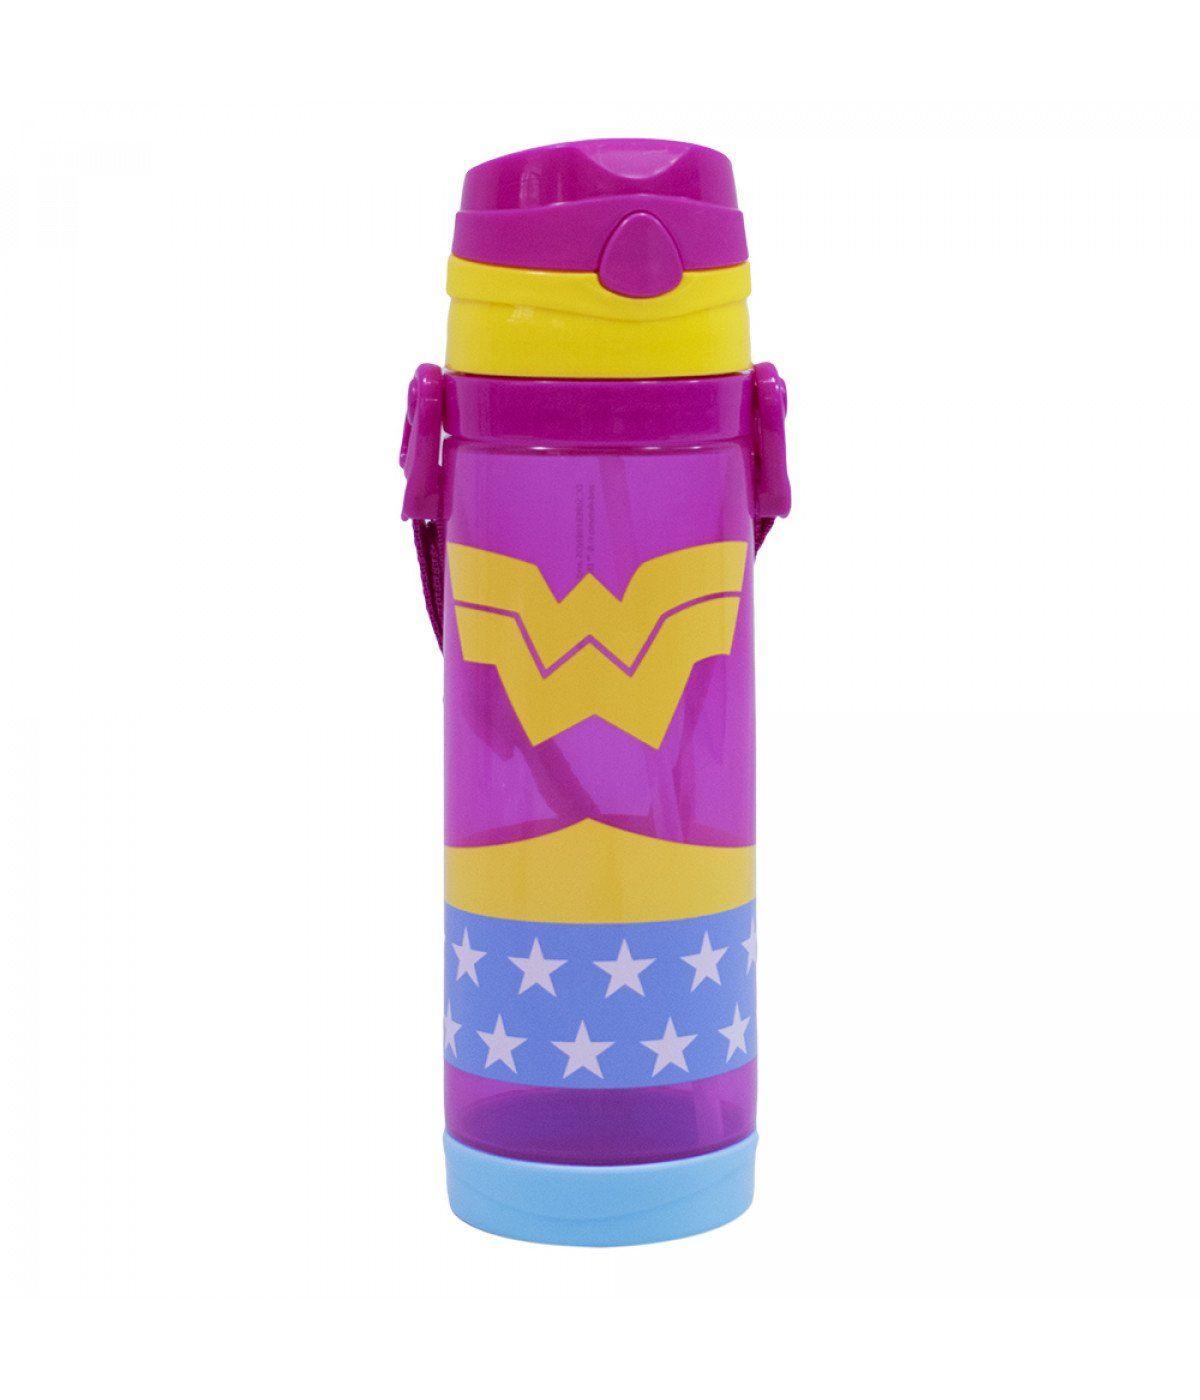 Garrafa de Plástico Mulher Maravilha: DC Super Friends